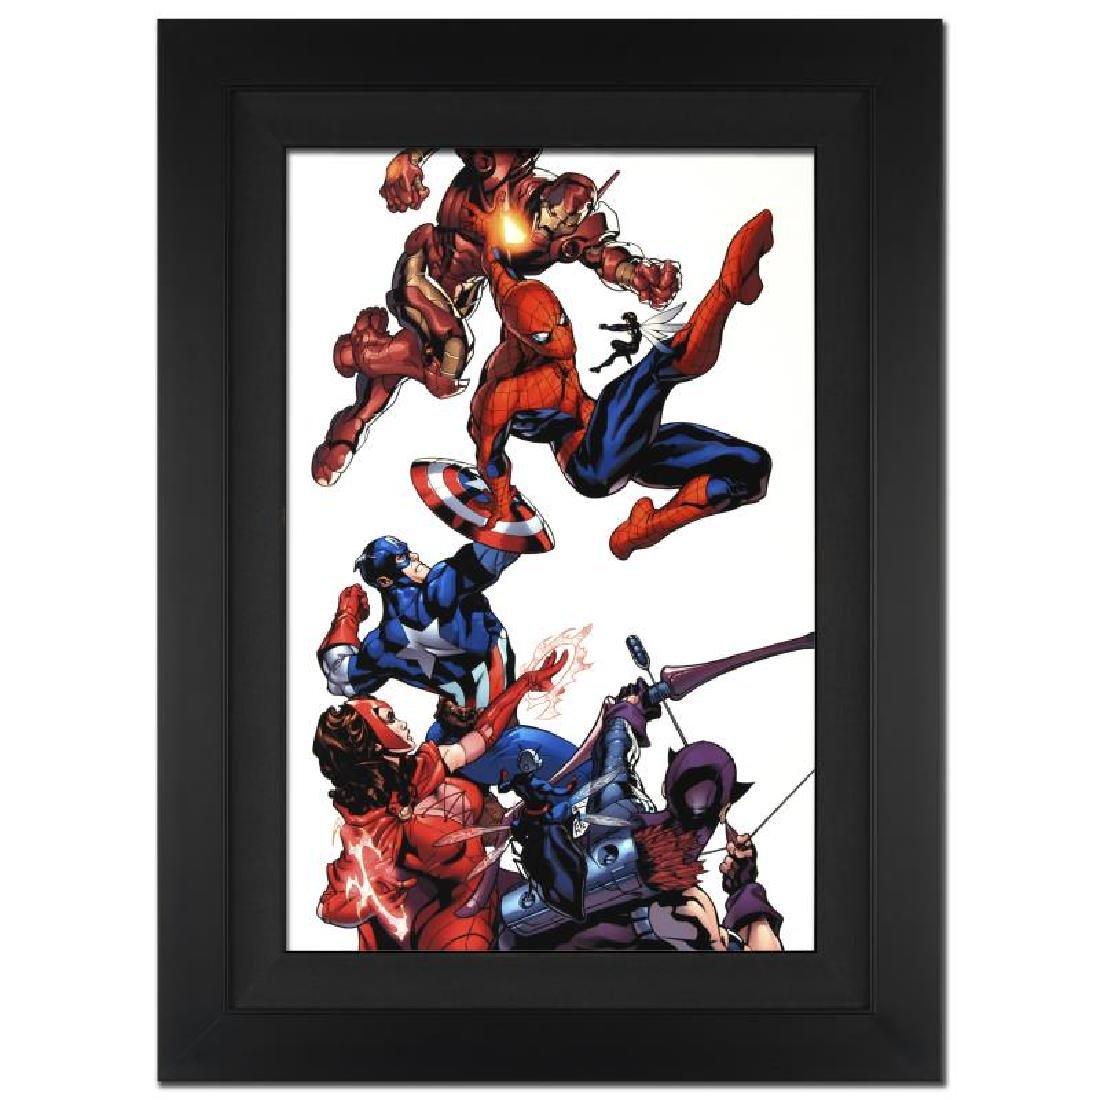 Marvel Knights Spider-Man #2 by Stan Lee - Marvel